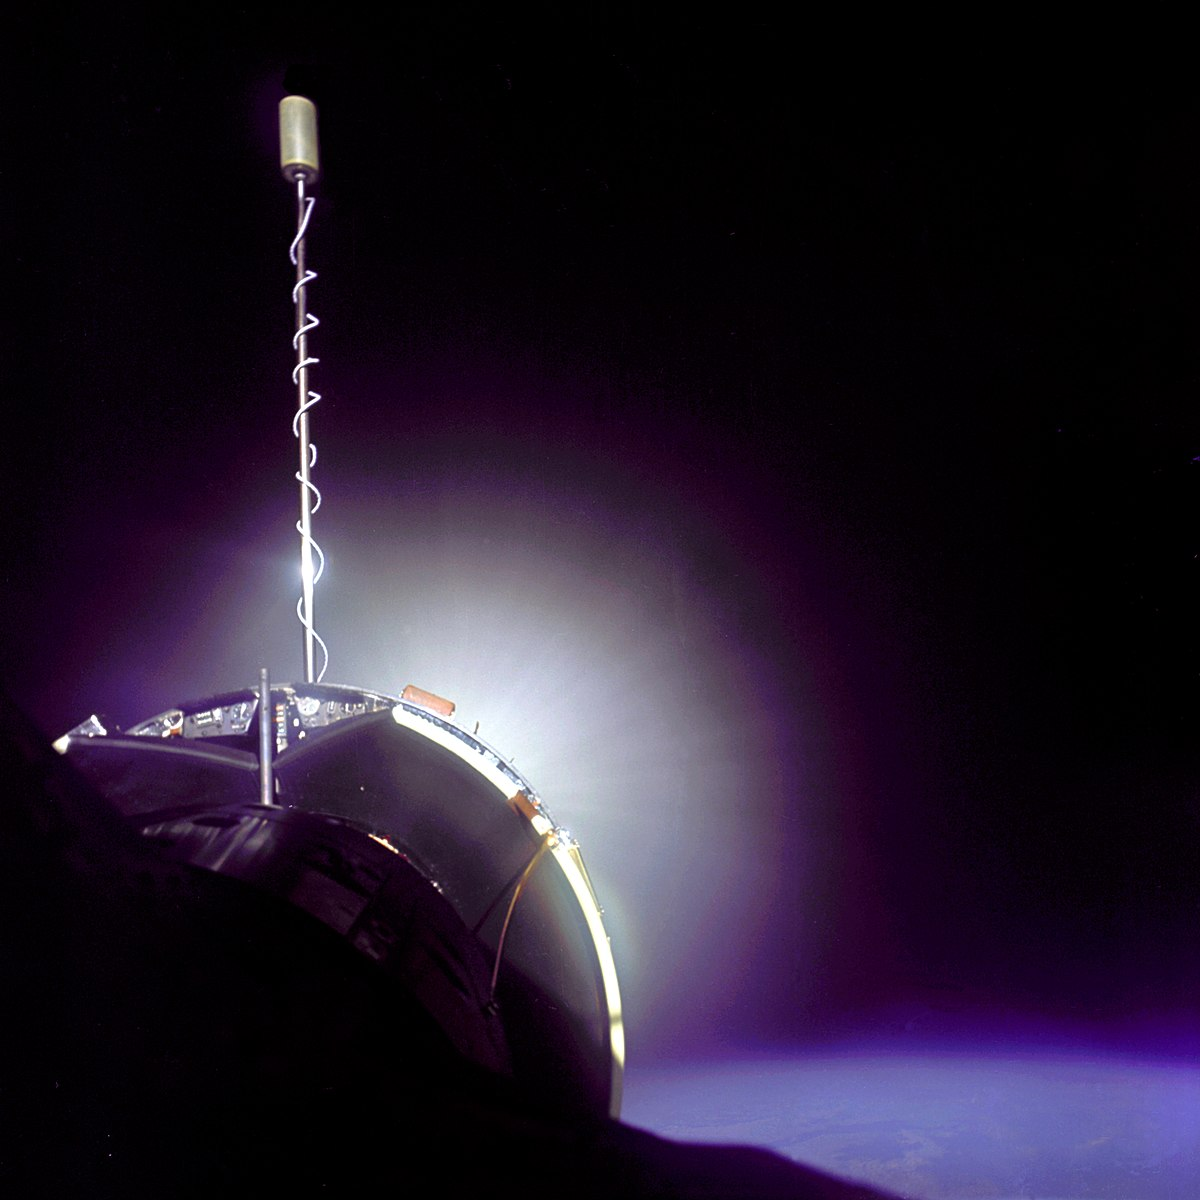 Kepler telescope suspended scientific observations